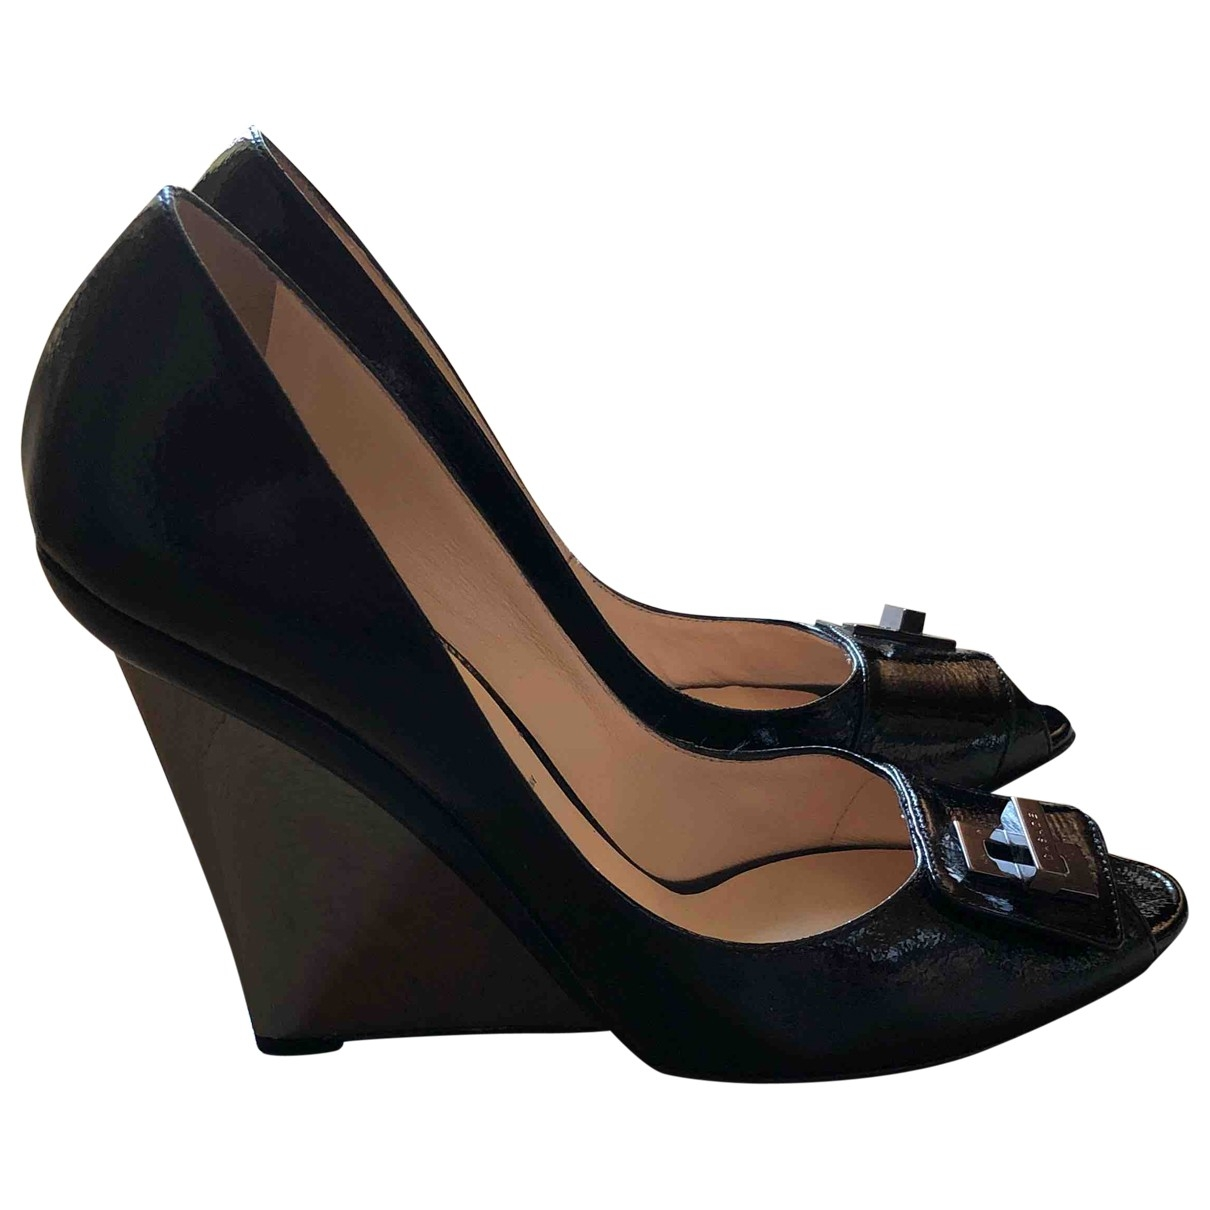 Casadei \N Black Patent leather Heels for Women 37 EU